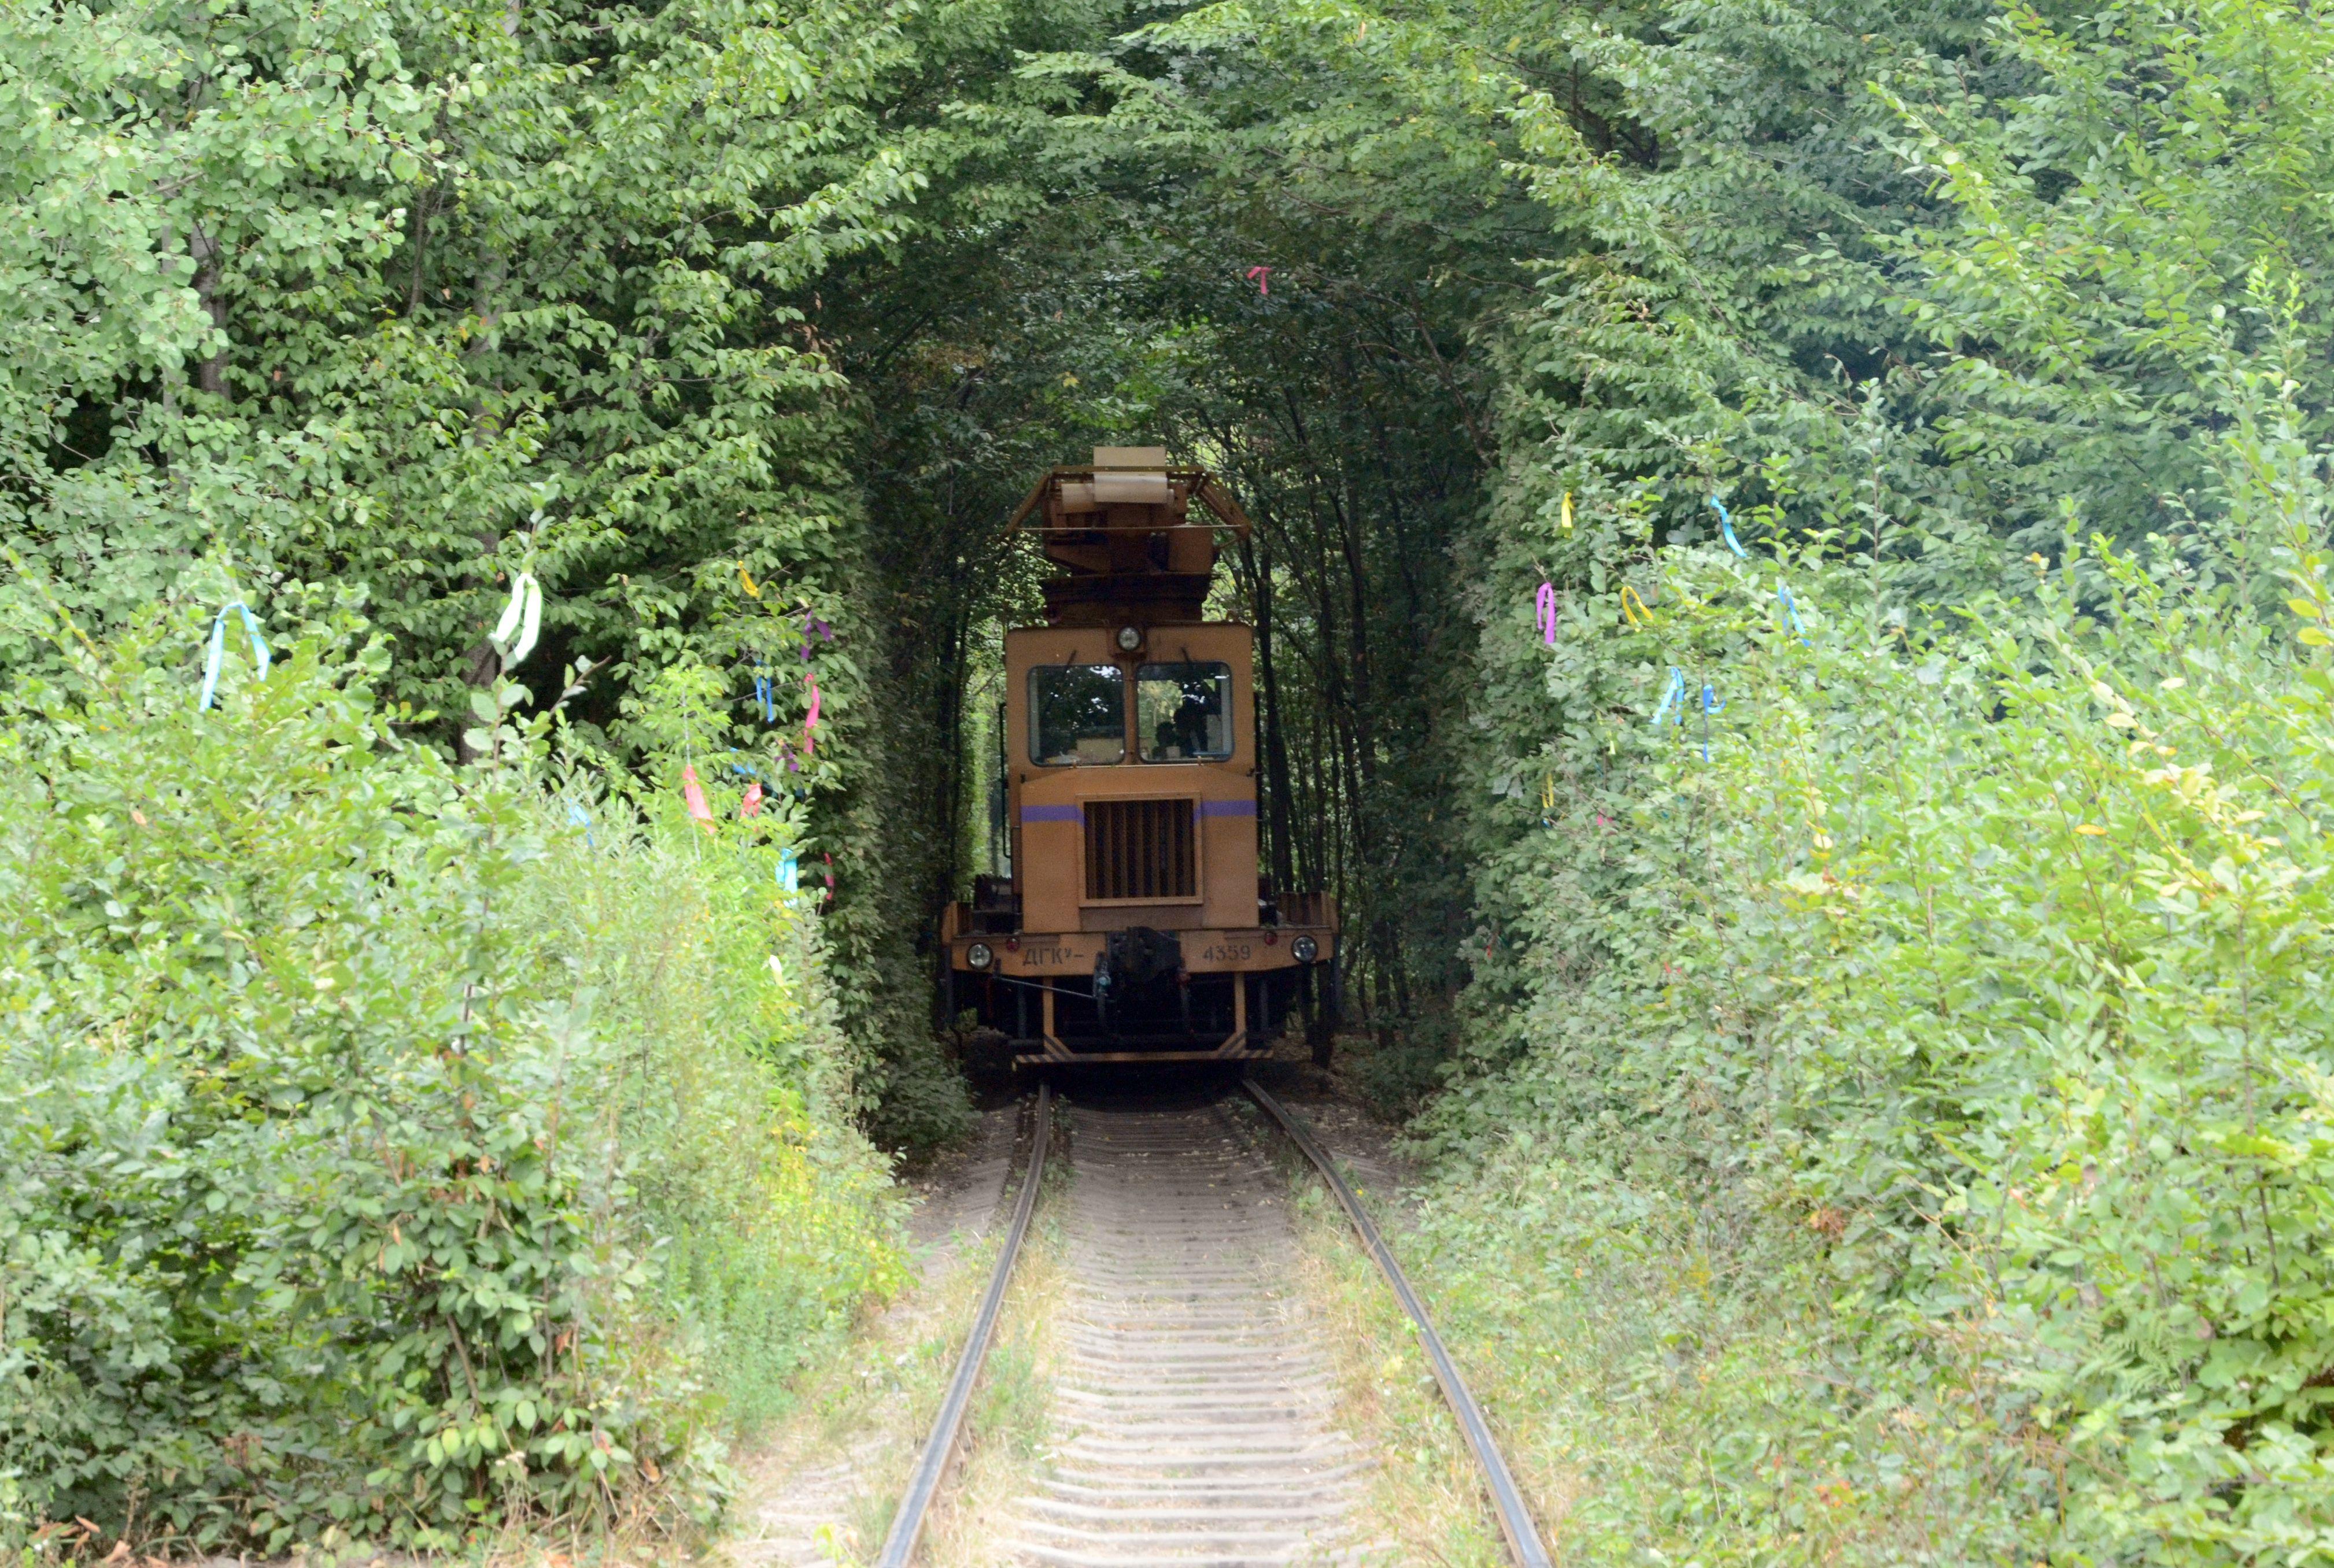 Tunnel of love Train